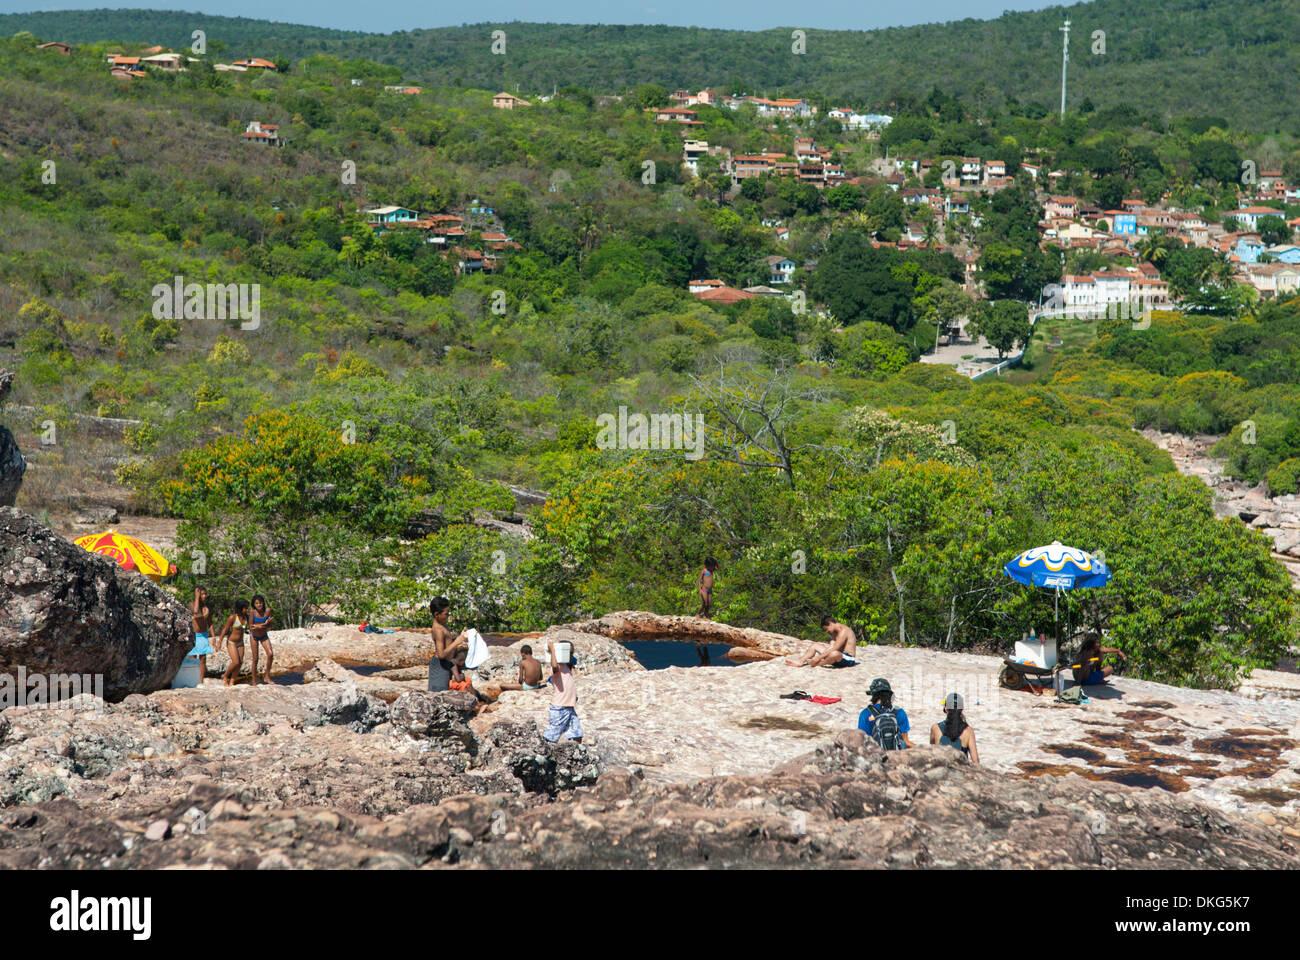 Parque Nacional de Chapada Diamantina, Lencois, Bahia, Brazil: Bathing at one of many Rio Lencois' natural pools. - Stock Image